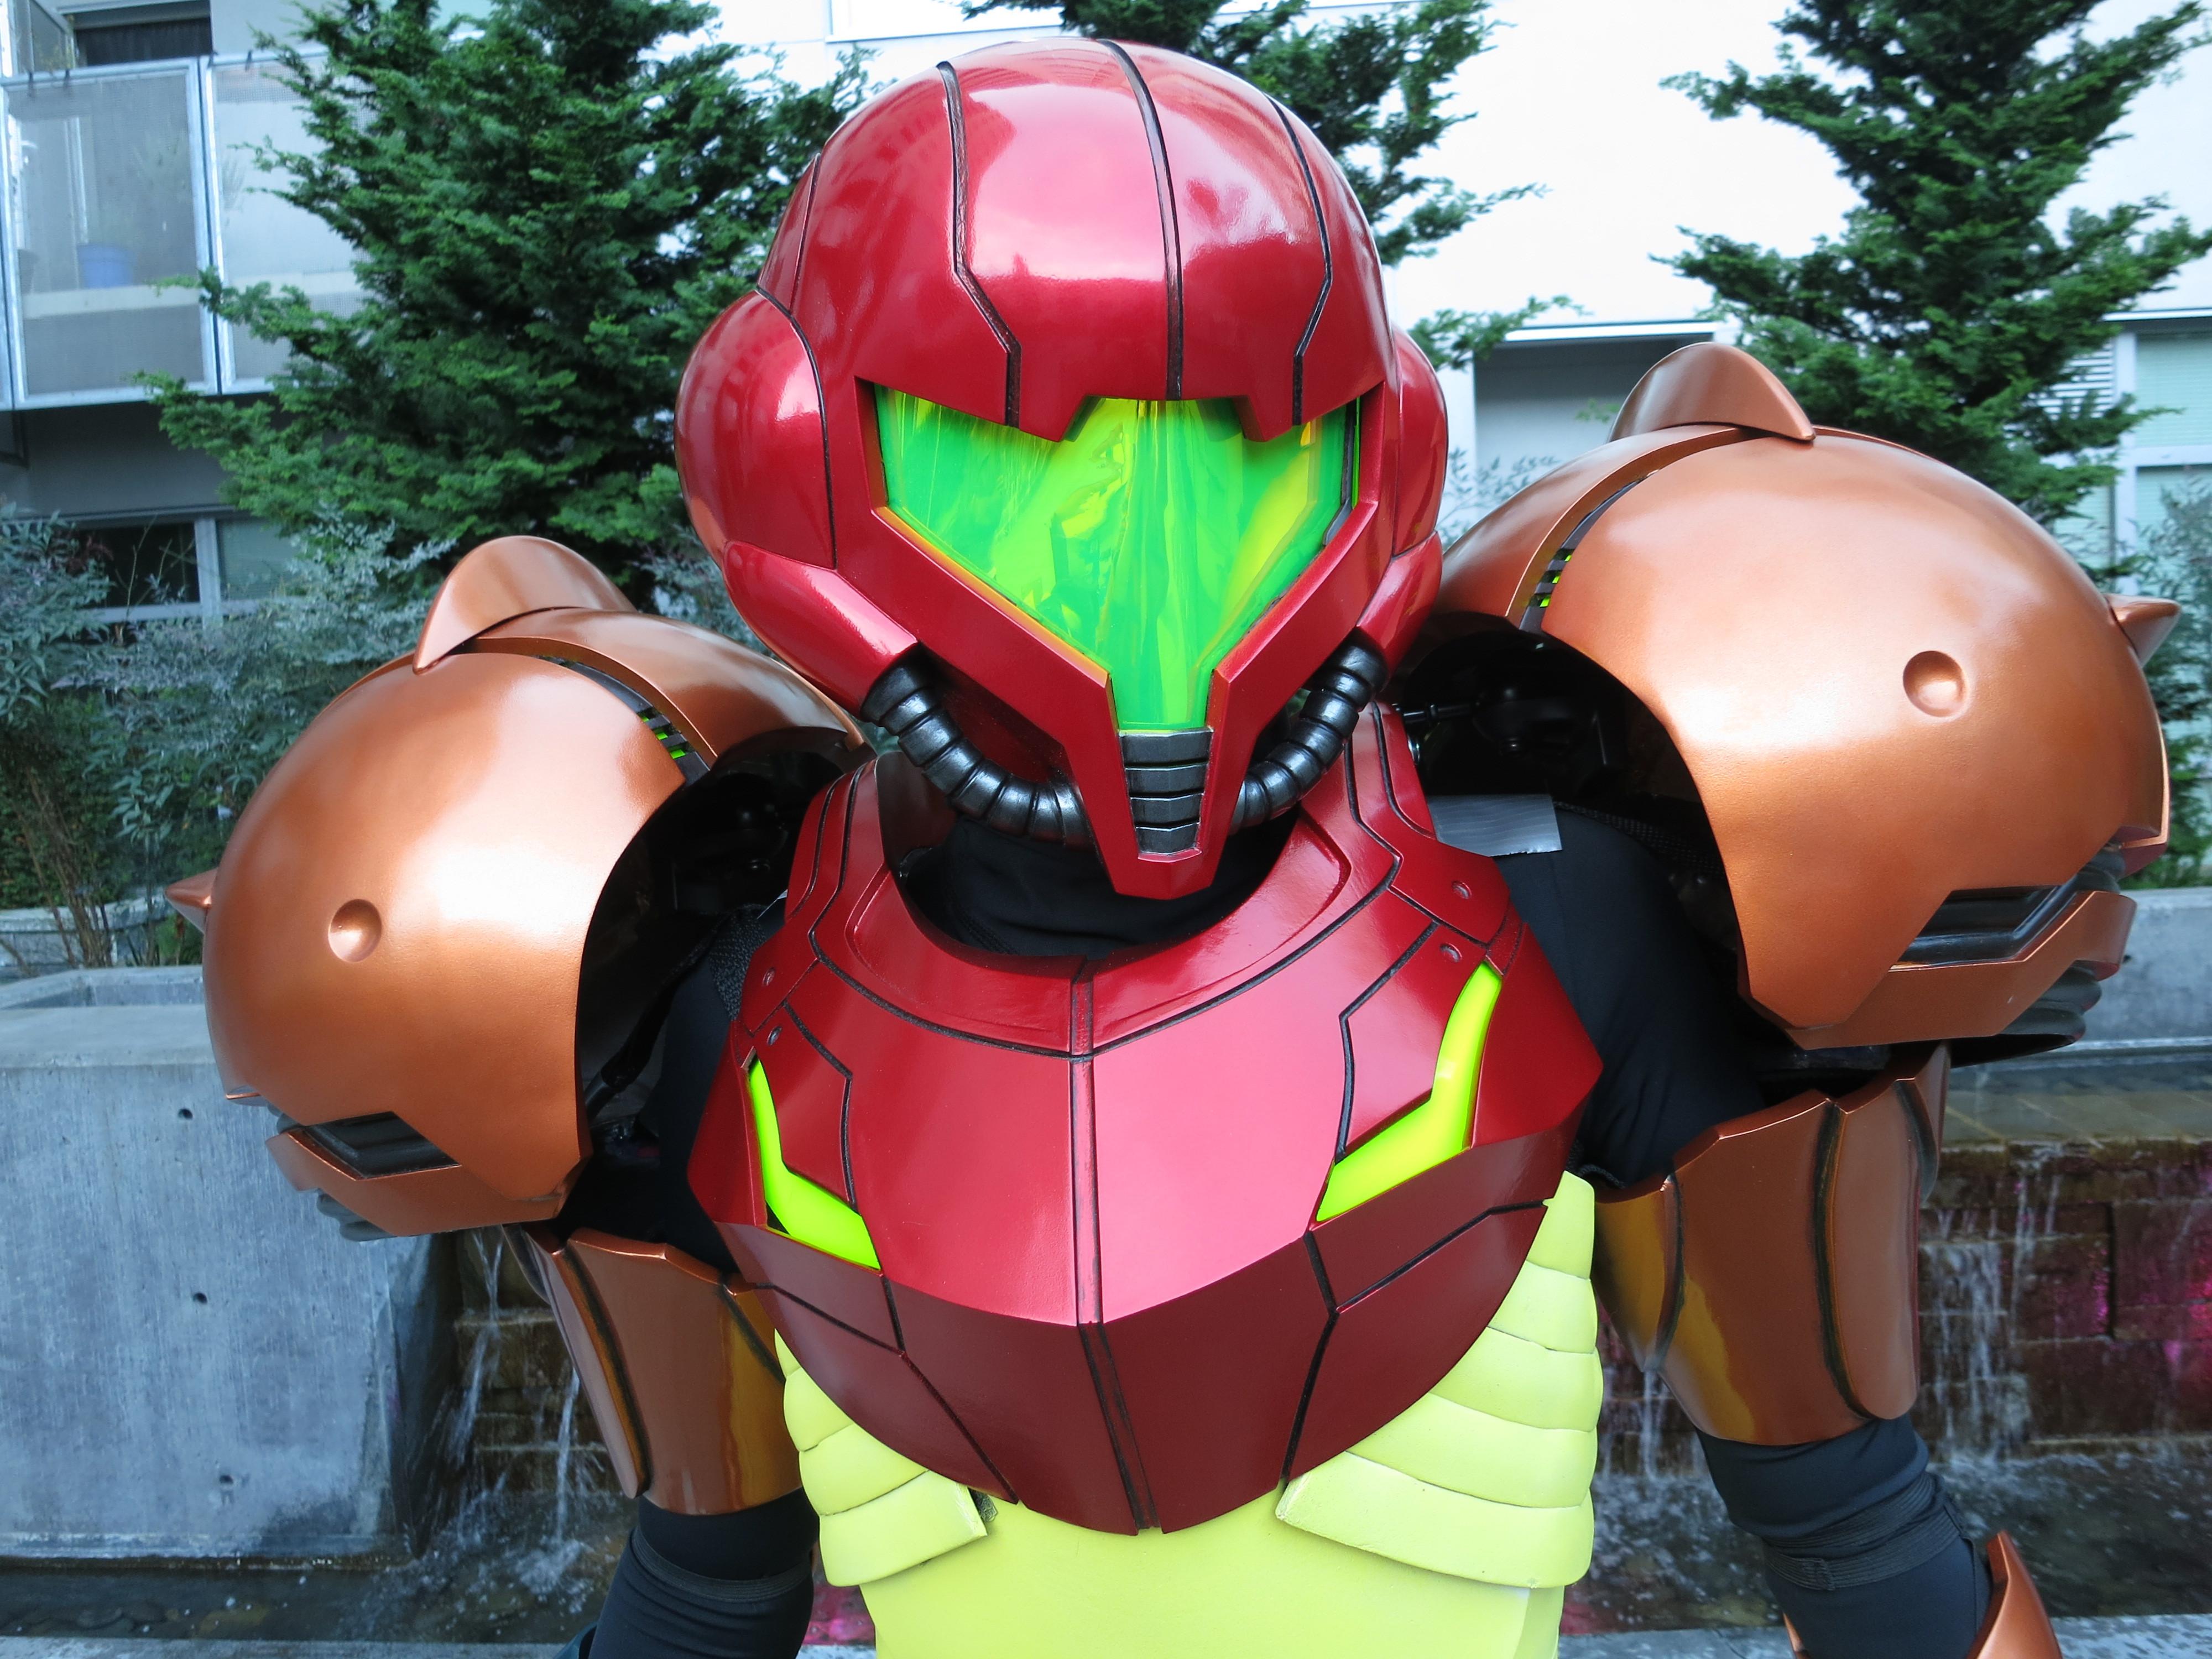 metroid samus aran 3d printing cosplay